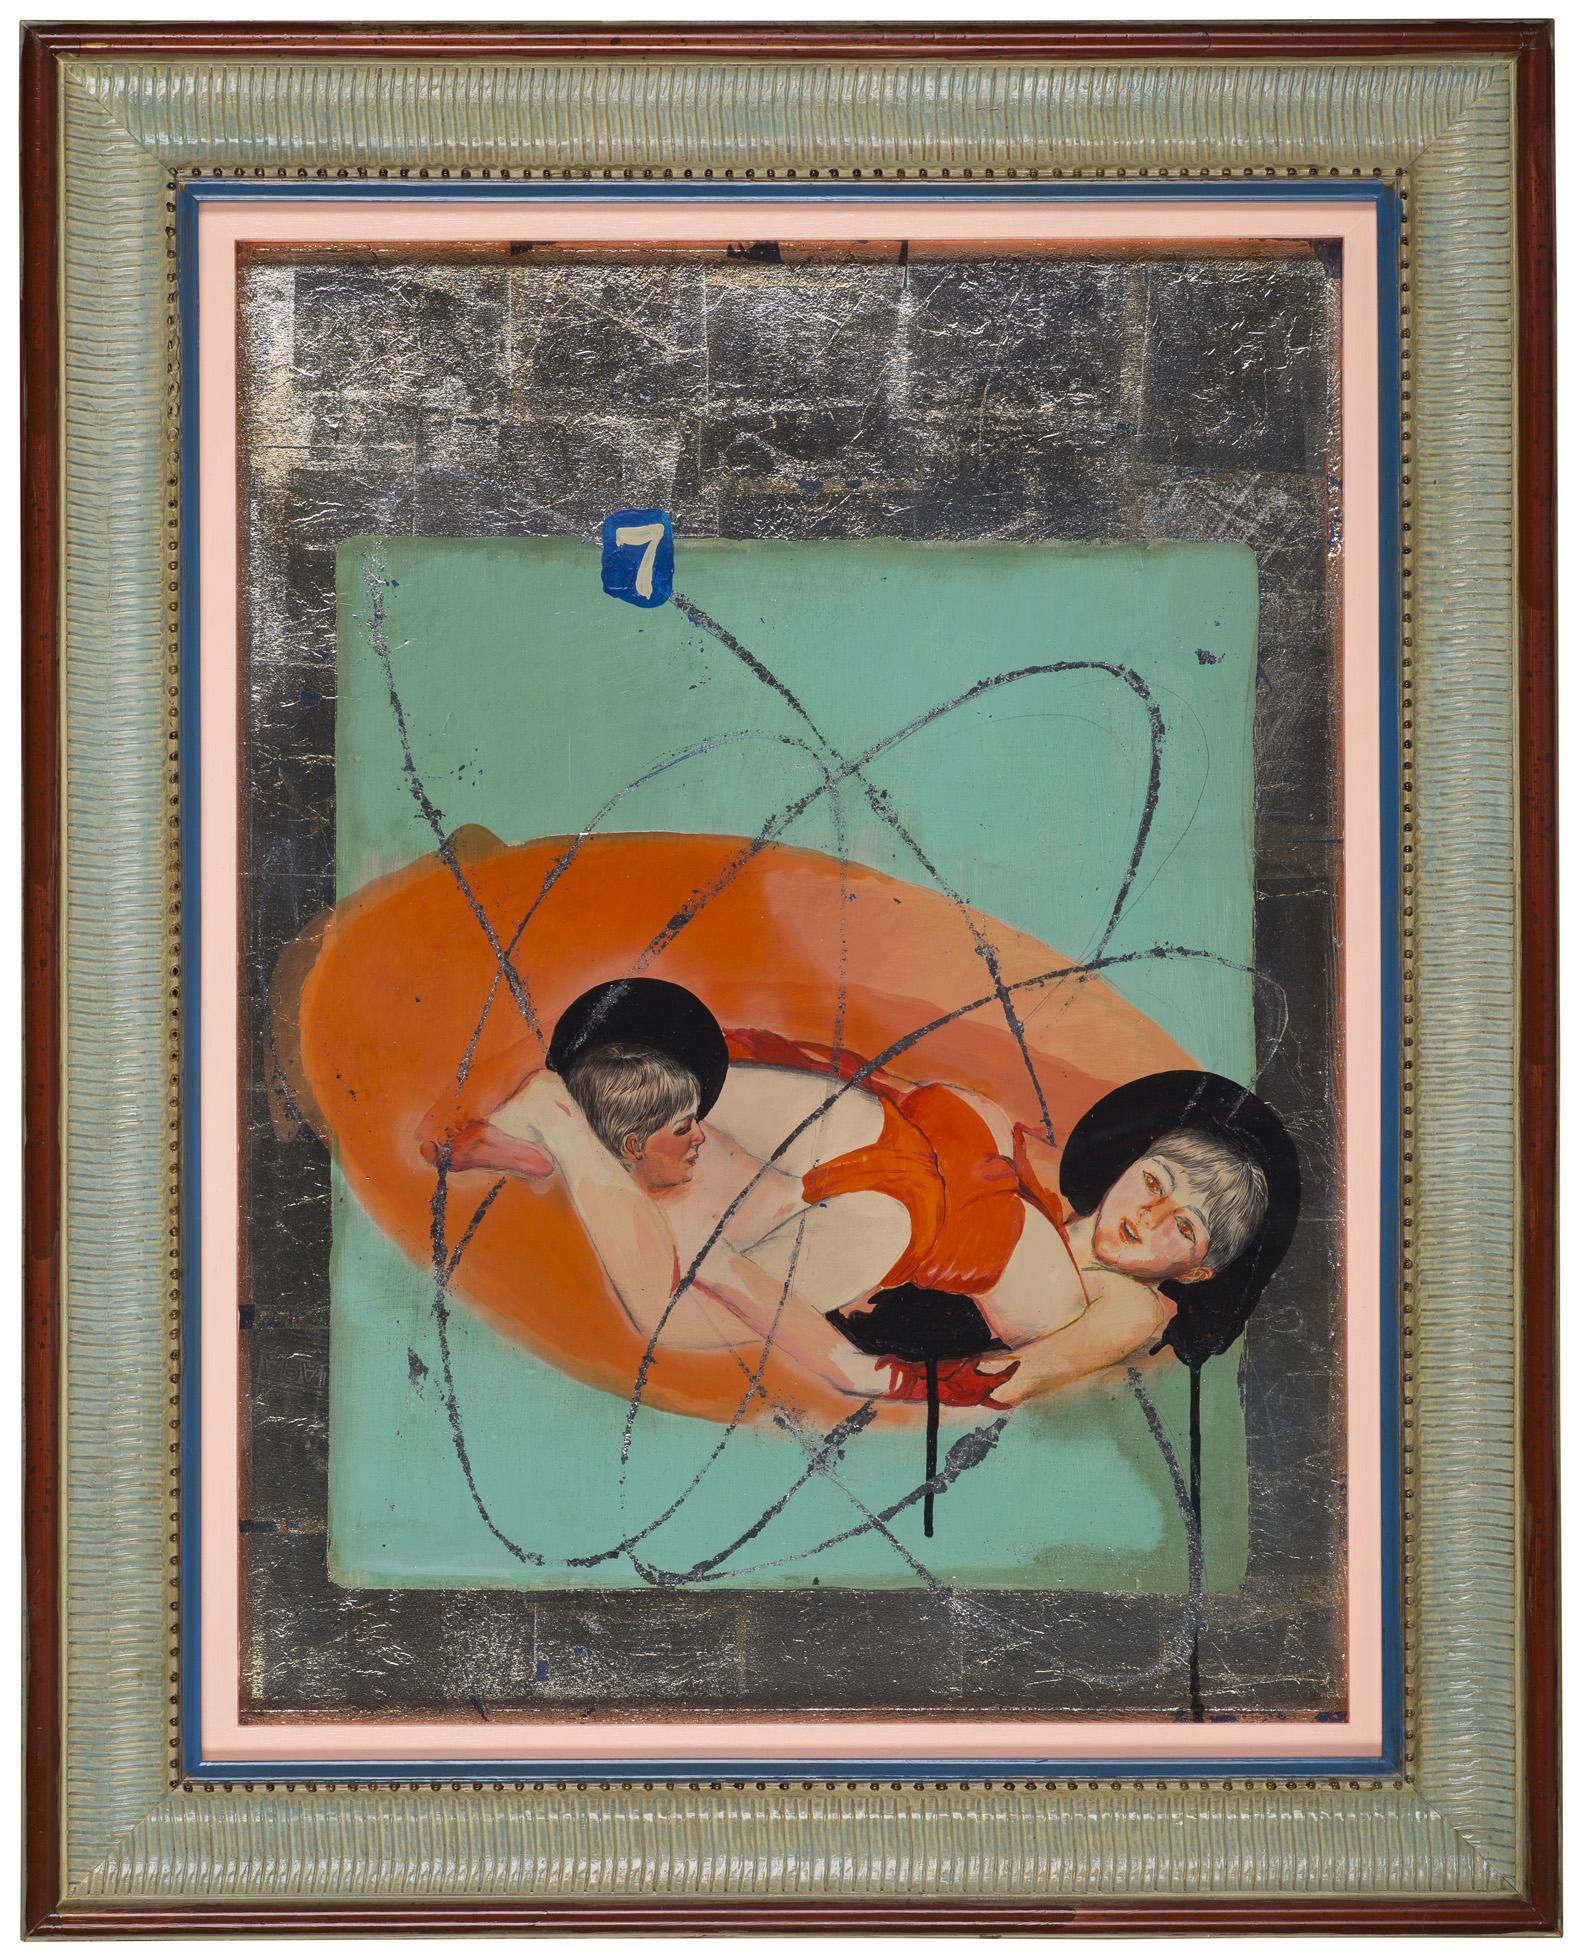 Wu Di 吴笛, Everything Is Beautiful in the Legend 传说一切都很美, 2014, Acrylic on board and silver foil 木板丙烯、银箔, 60 x 45 cm